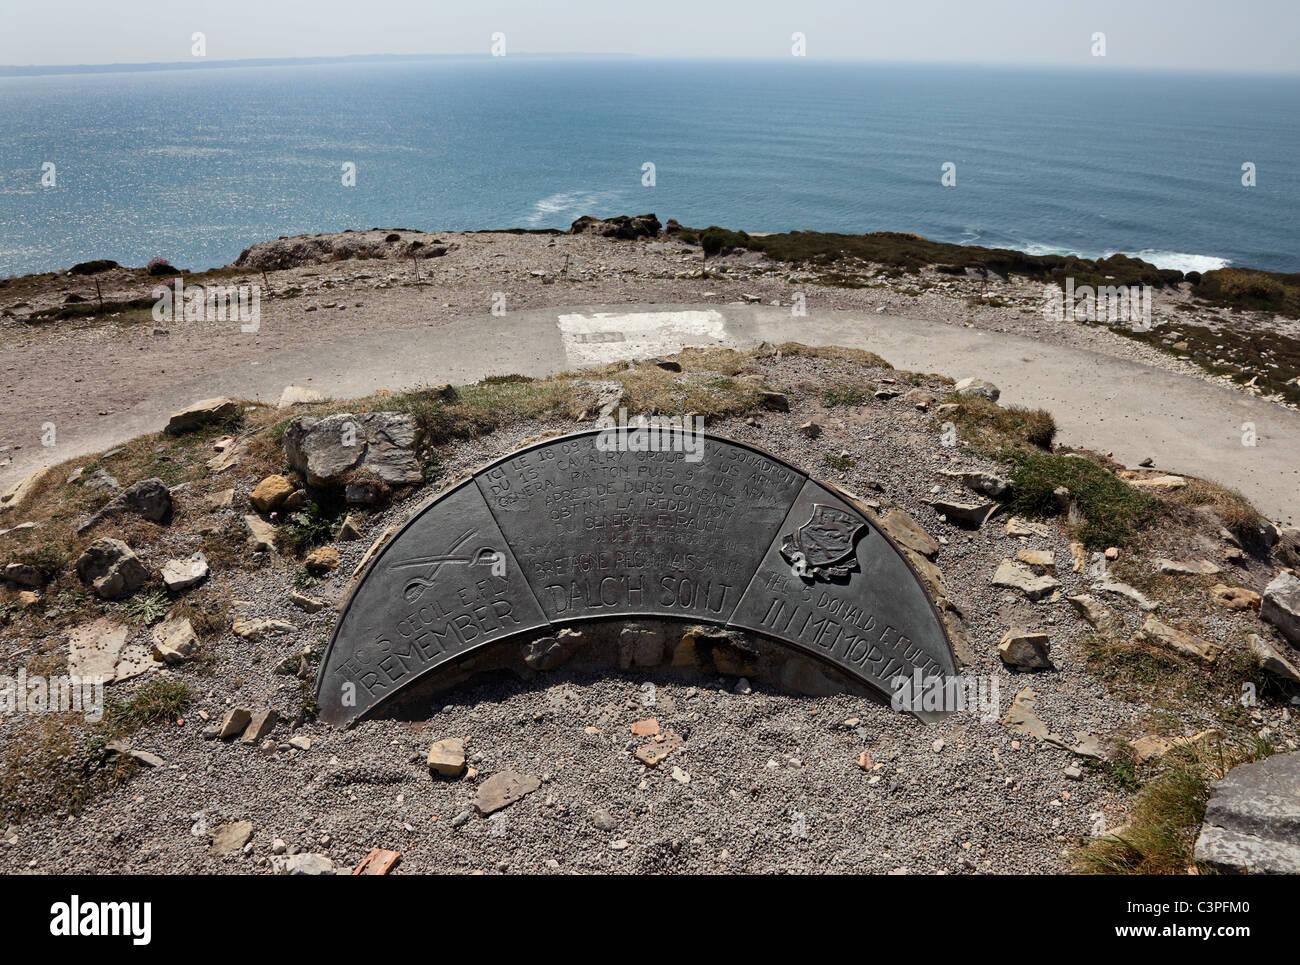 WW2 Memorial at the Cap de la Chevre Brittany France - Stock Image